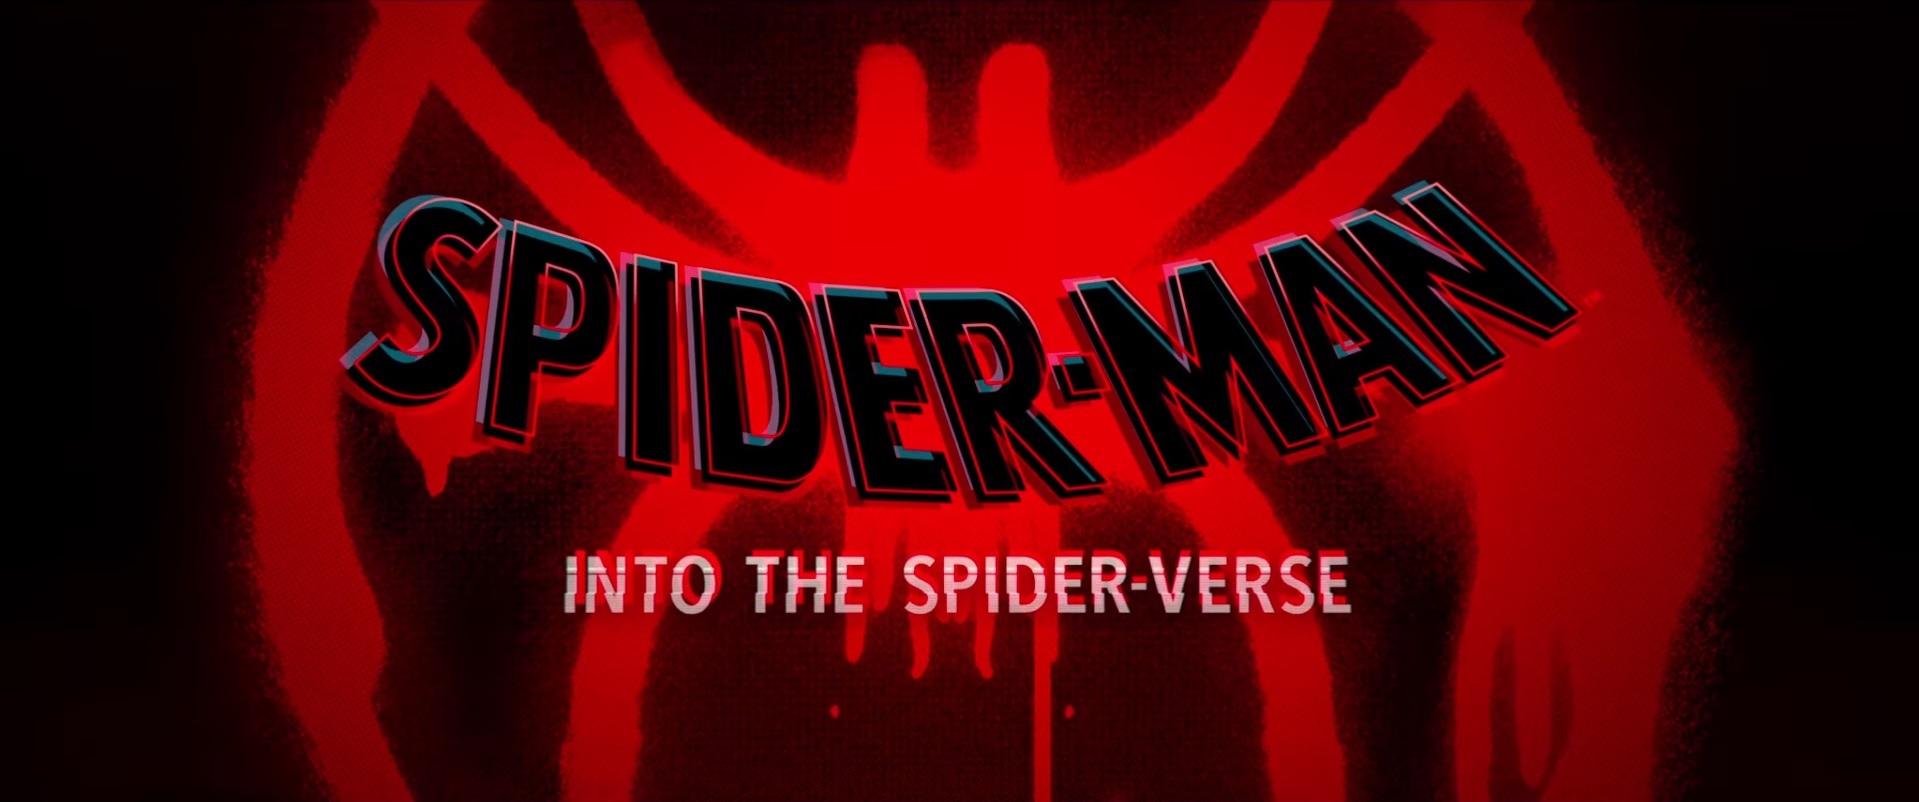 Spider-Man Into The Spider-Verse Fonts? - forum | dafont com